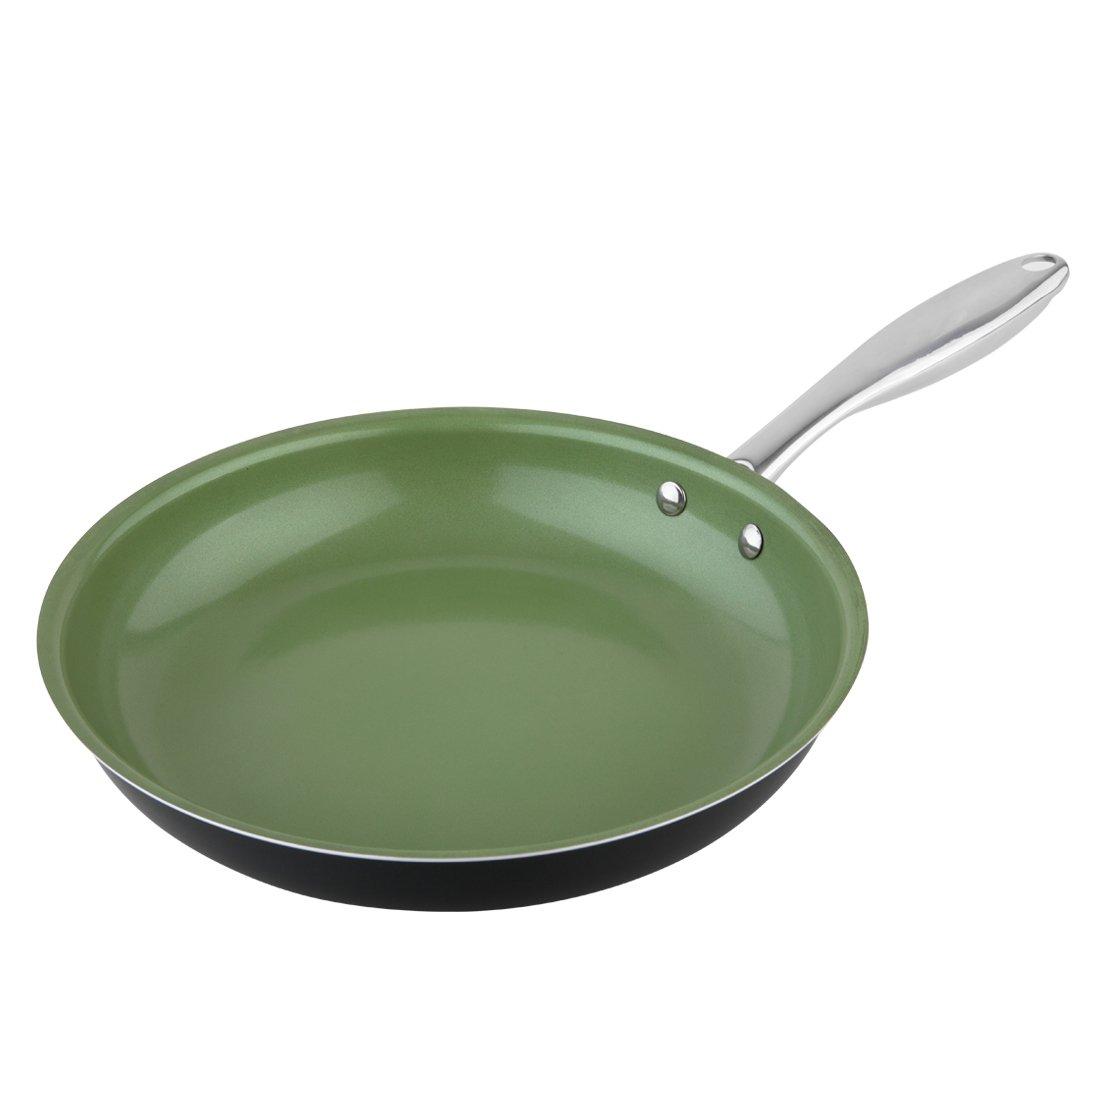 MICHELANGELO Premium Green Frying Pan Ceramic Nonstick With Stainless Steel Handle German Technology, Green Frying Pan Nonstick, Stir Fry Pan Green Ceramic Skillet, Green Pan Skillet Nonstick 11 Inch